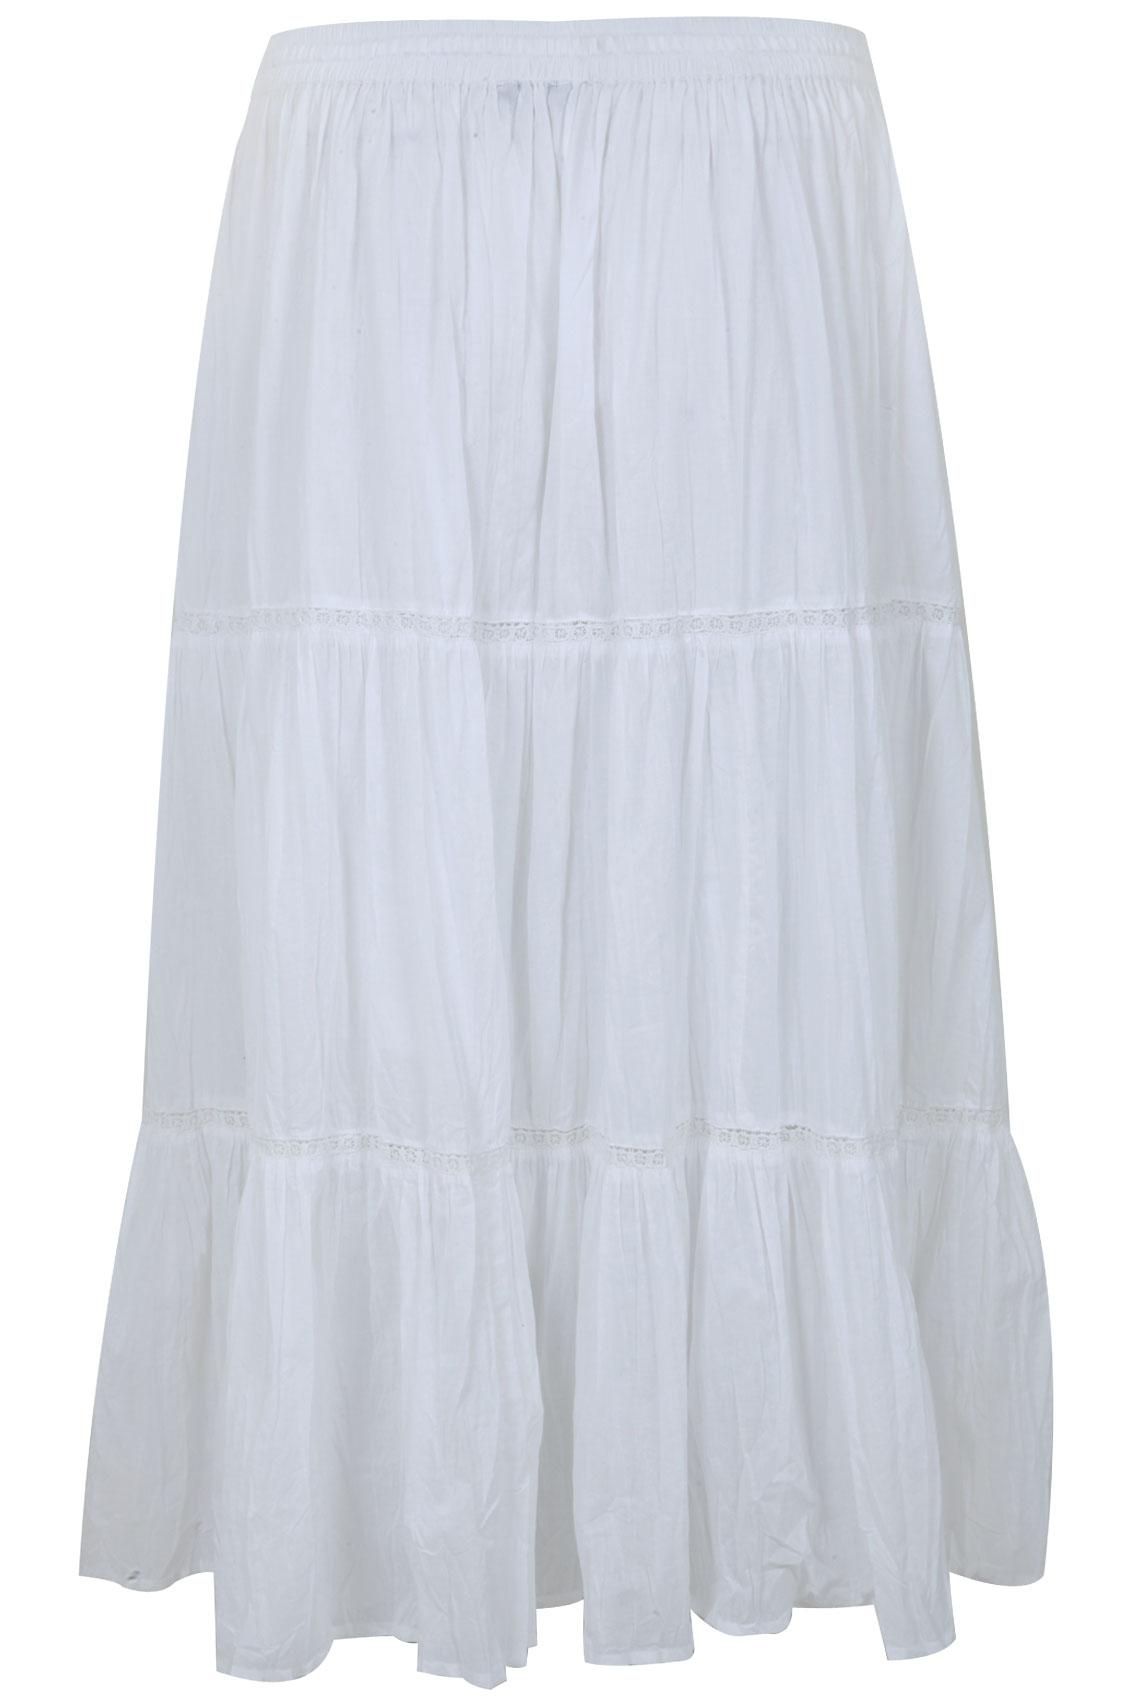 white cotton voile maxi skirt with crochet detail plus